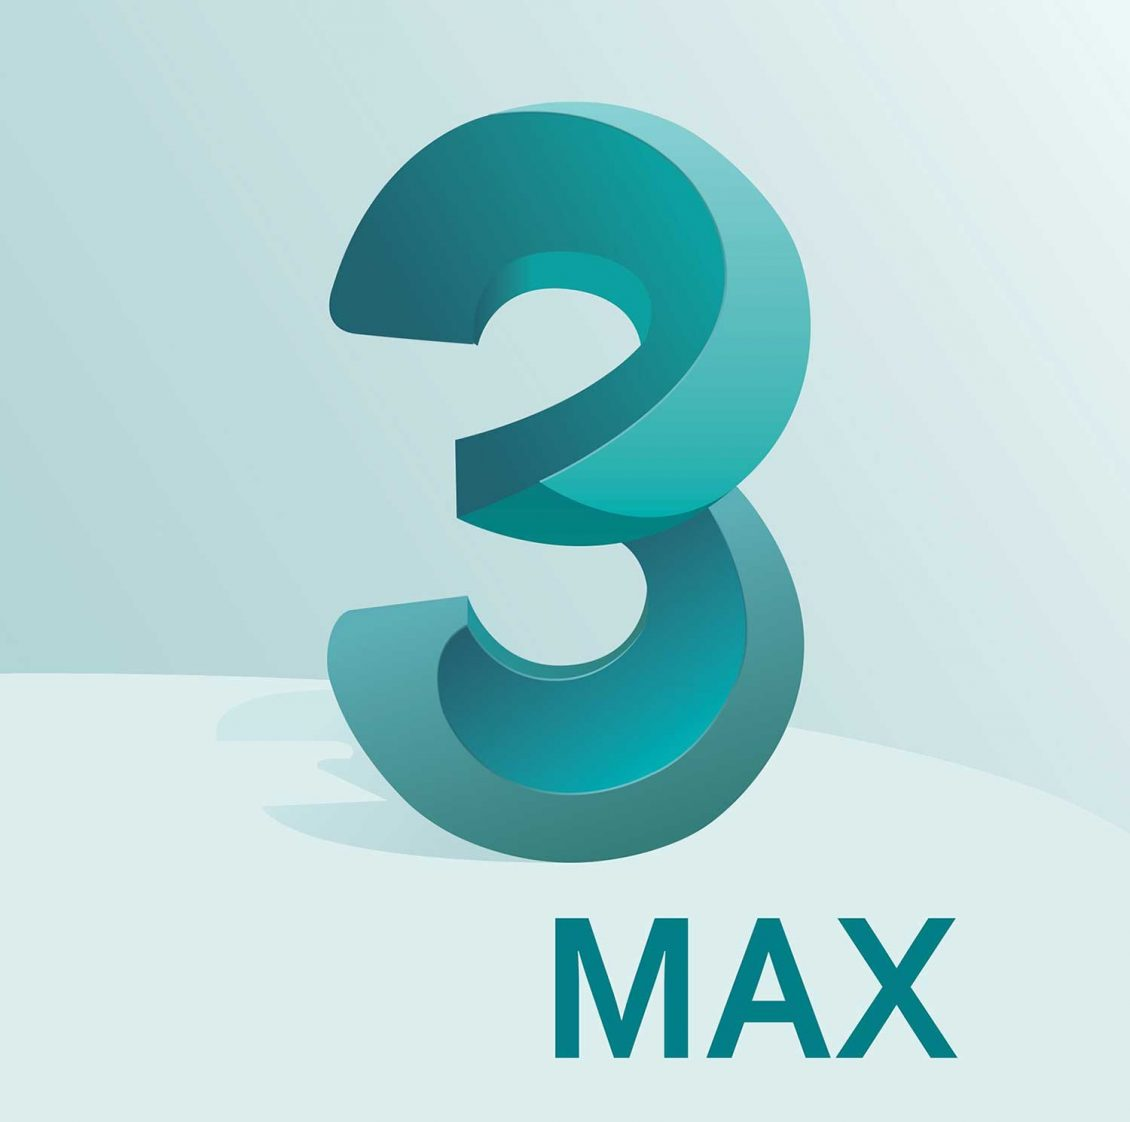 3dsmax 6 1130x1122 - آموزش رایگان و کامل ۳Ds Max به زبان فارسی